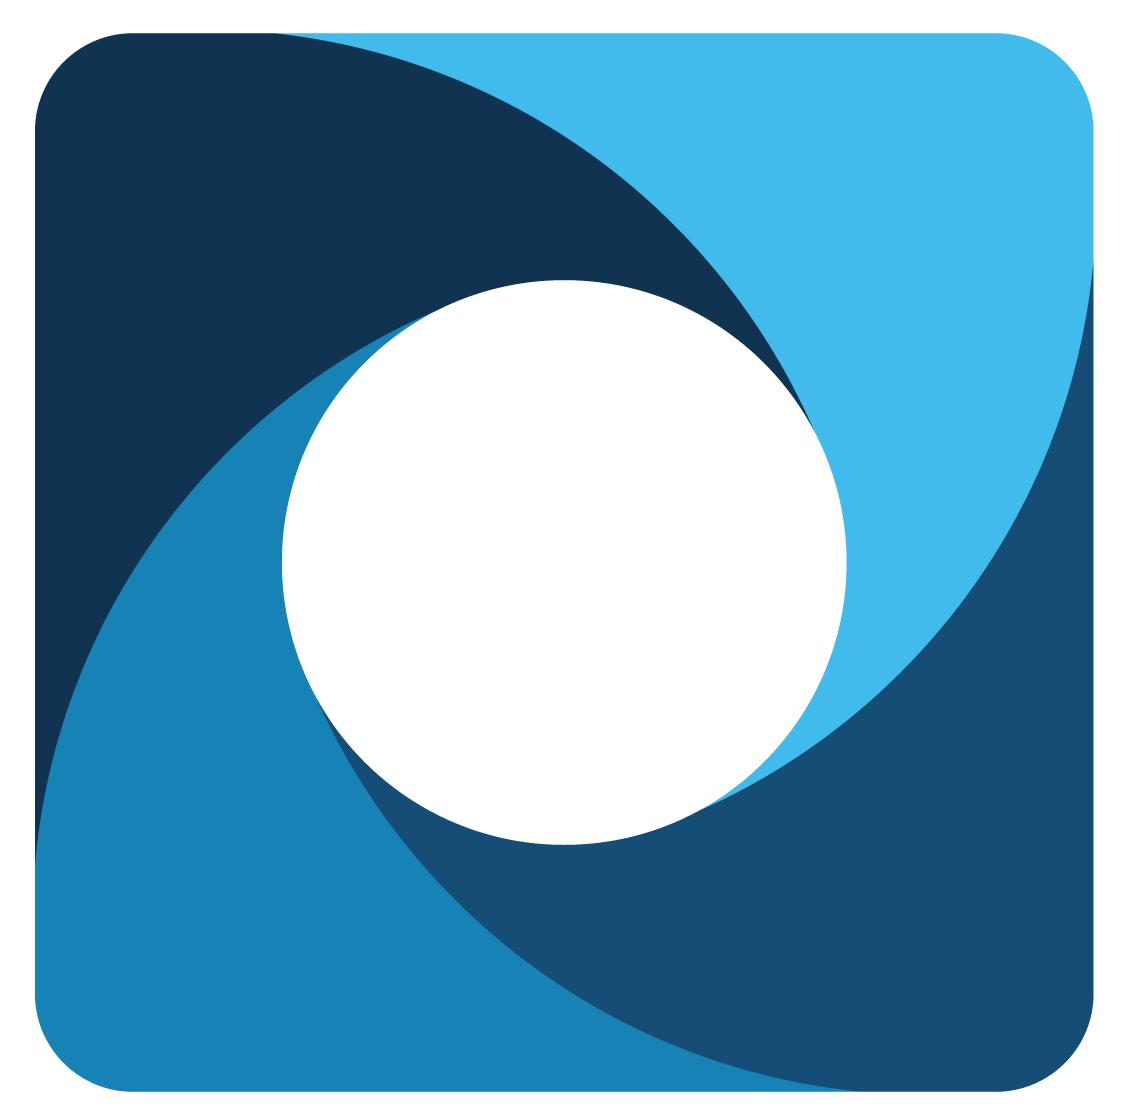 DATNAV-logo-square copy (1).jpg